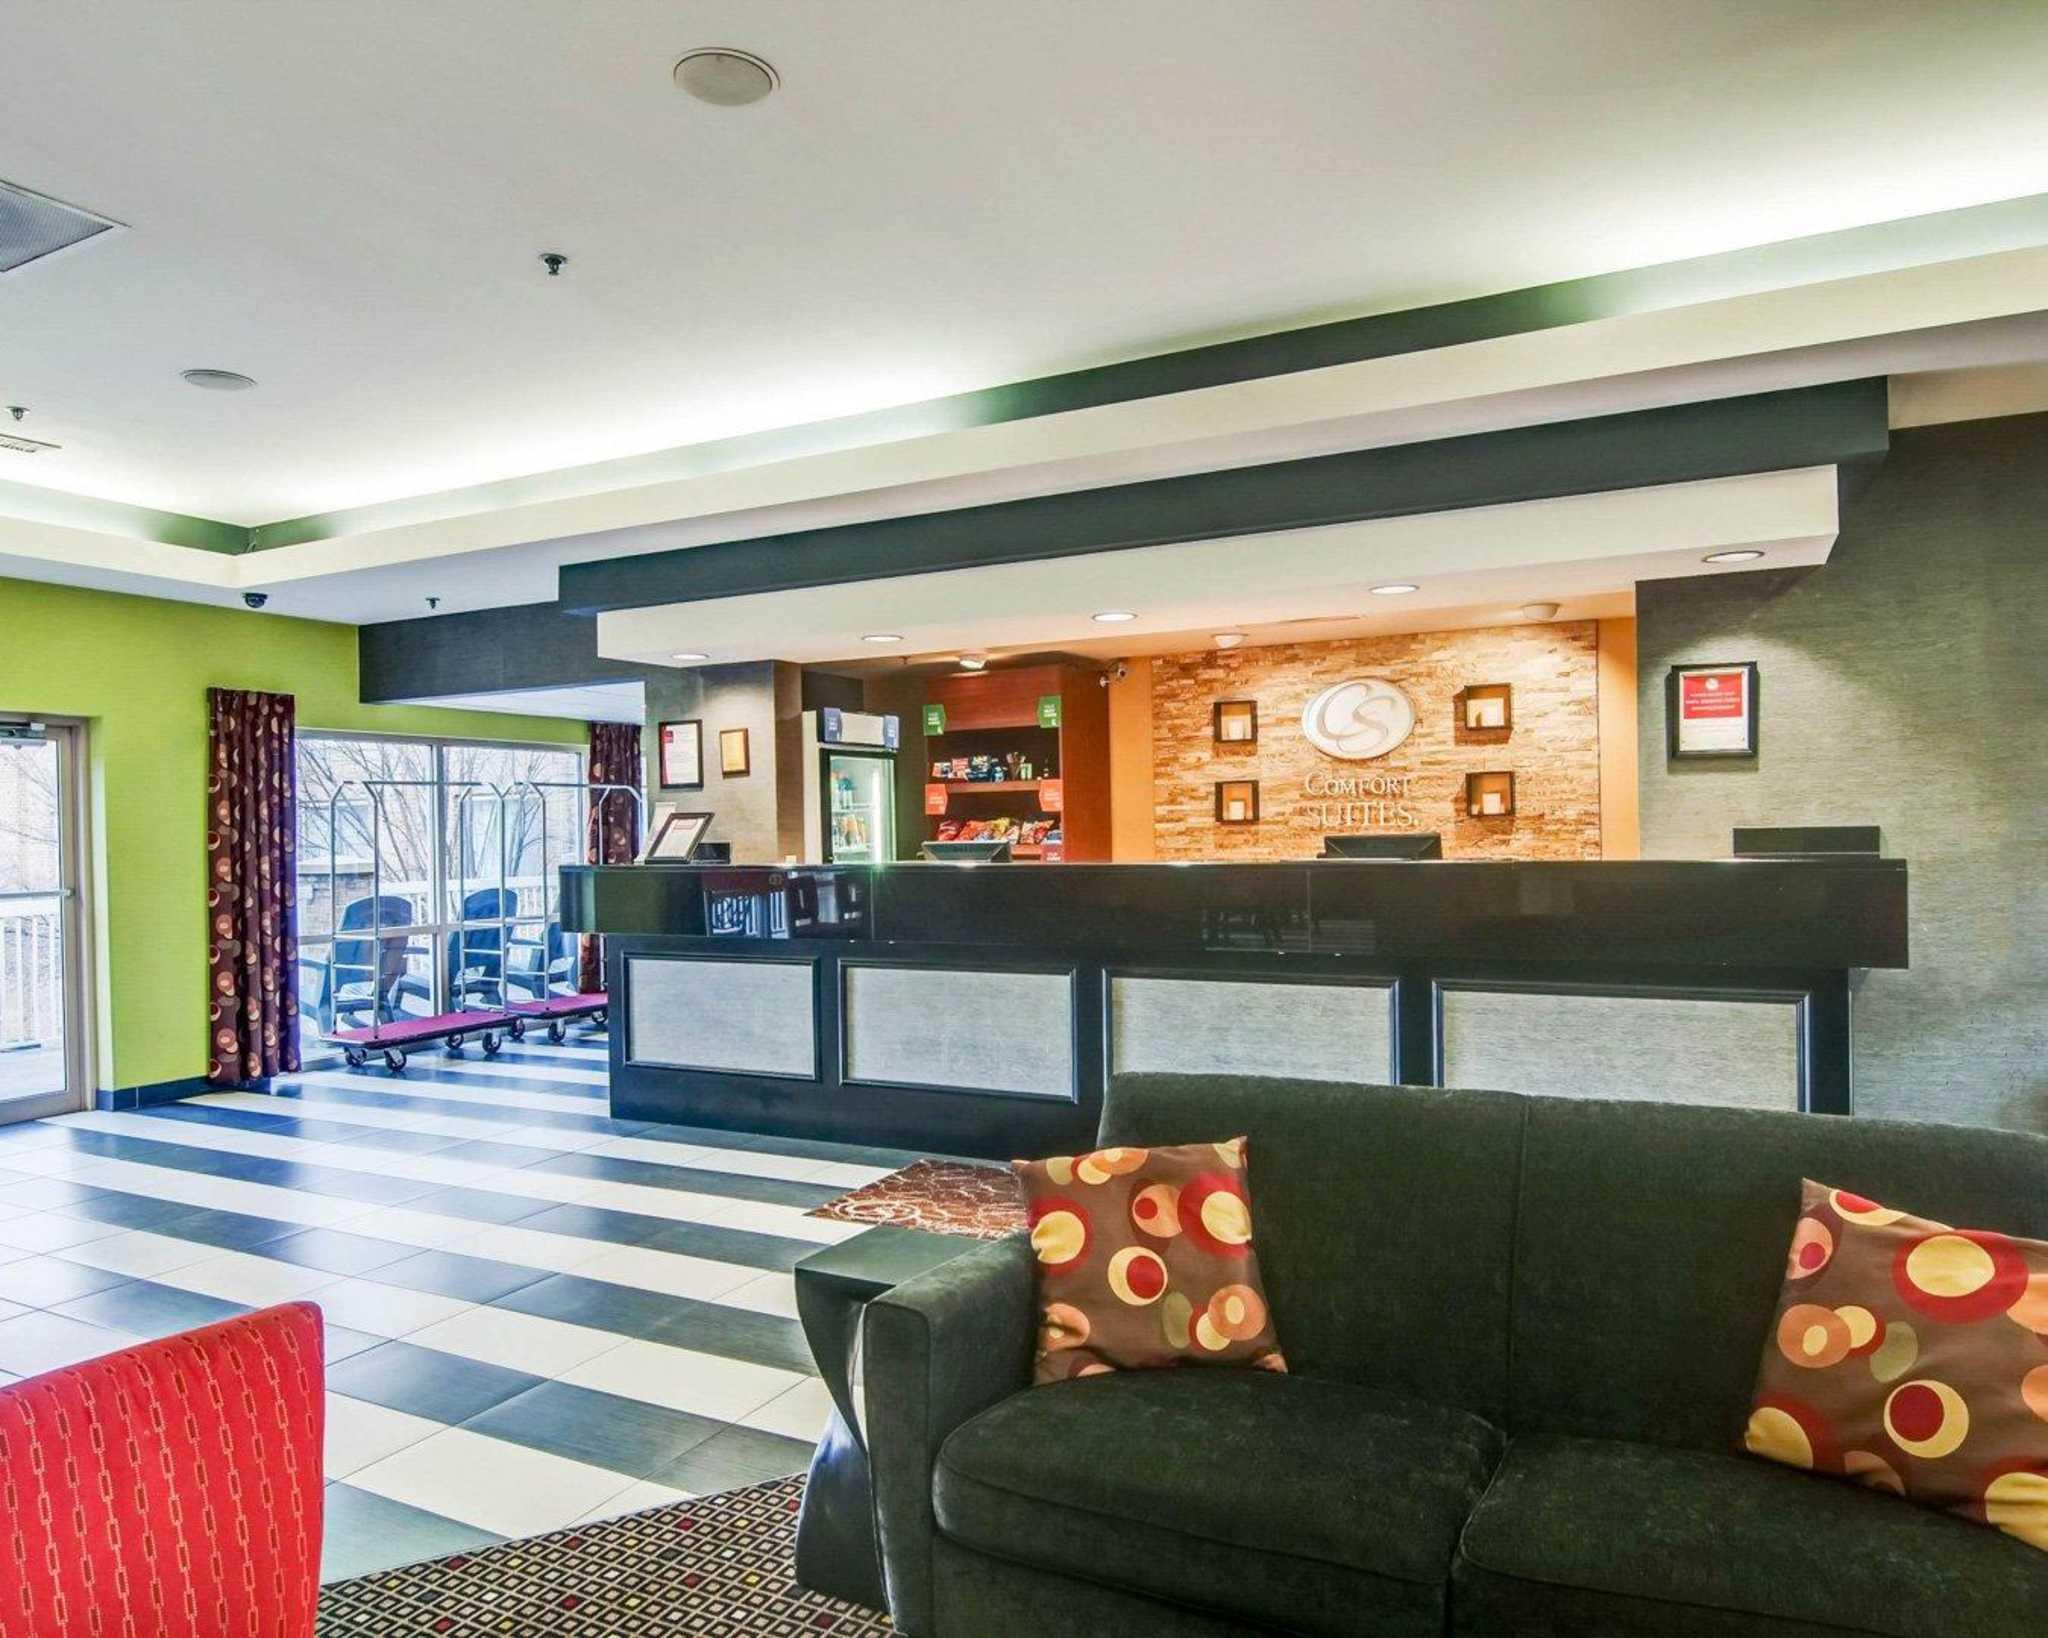 Comfort Suites Inn at Ridgewood Farm image 11